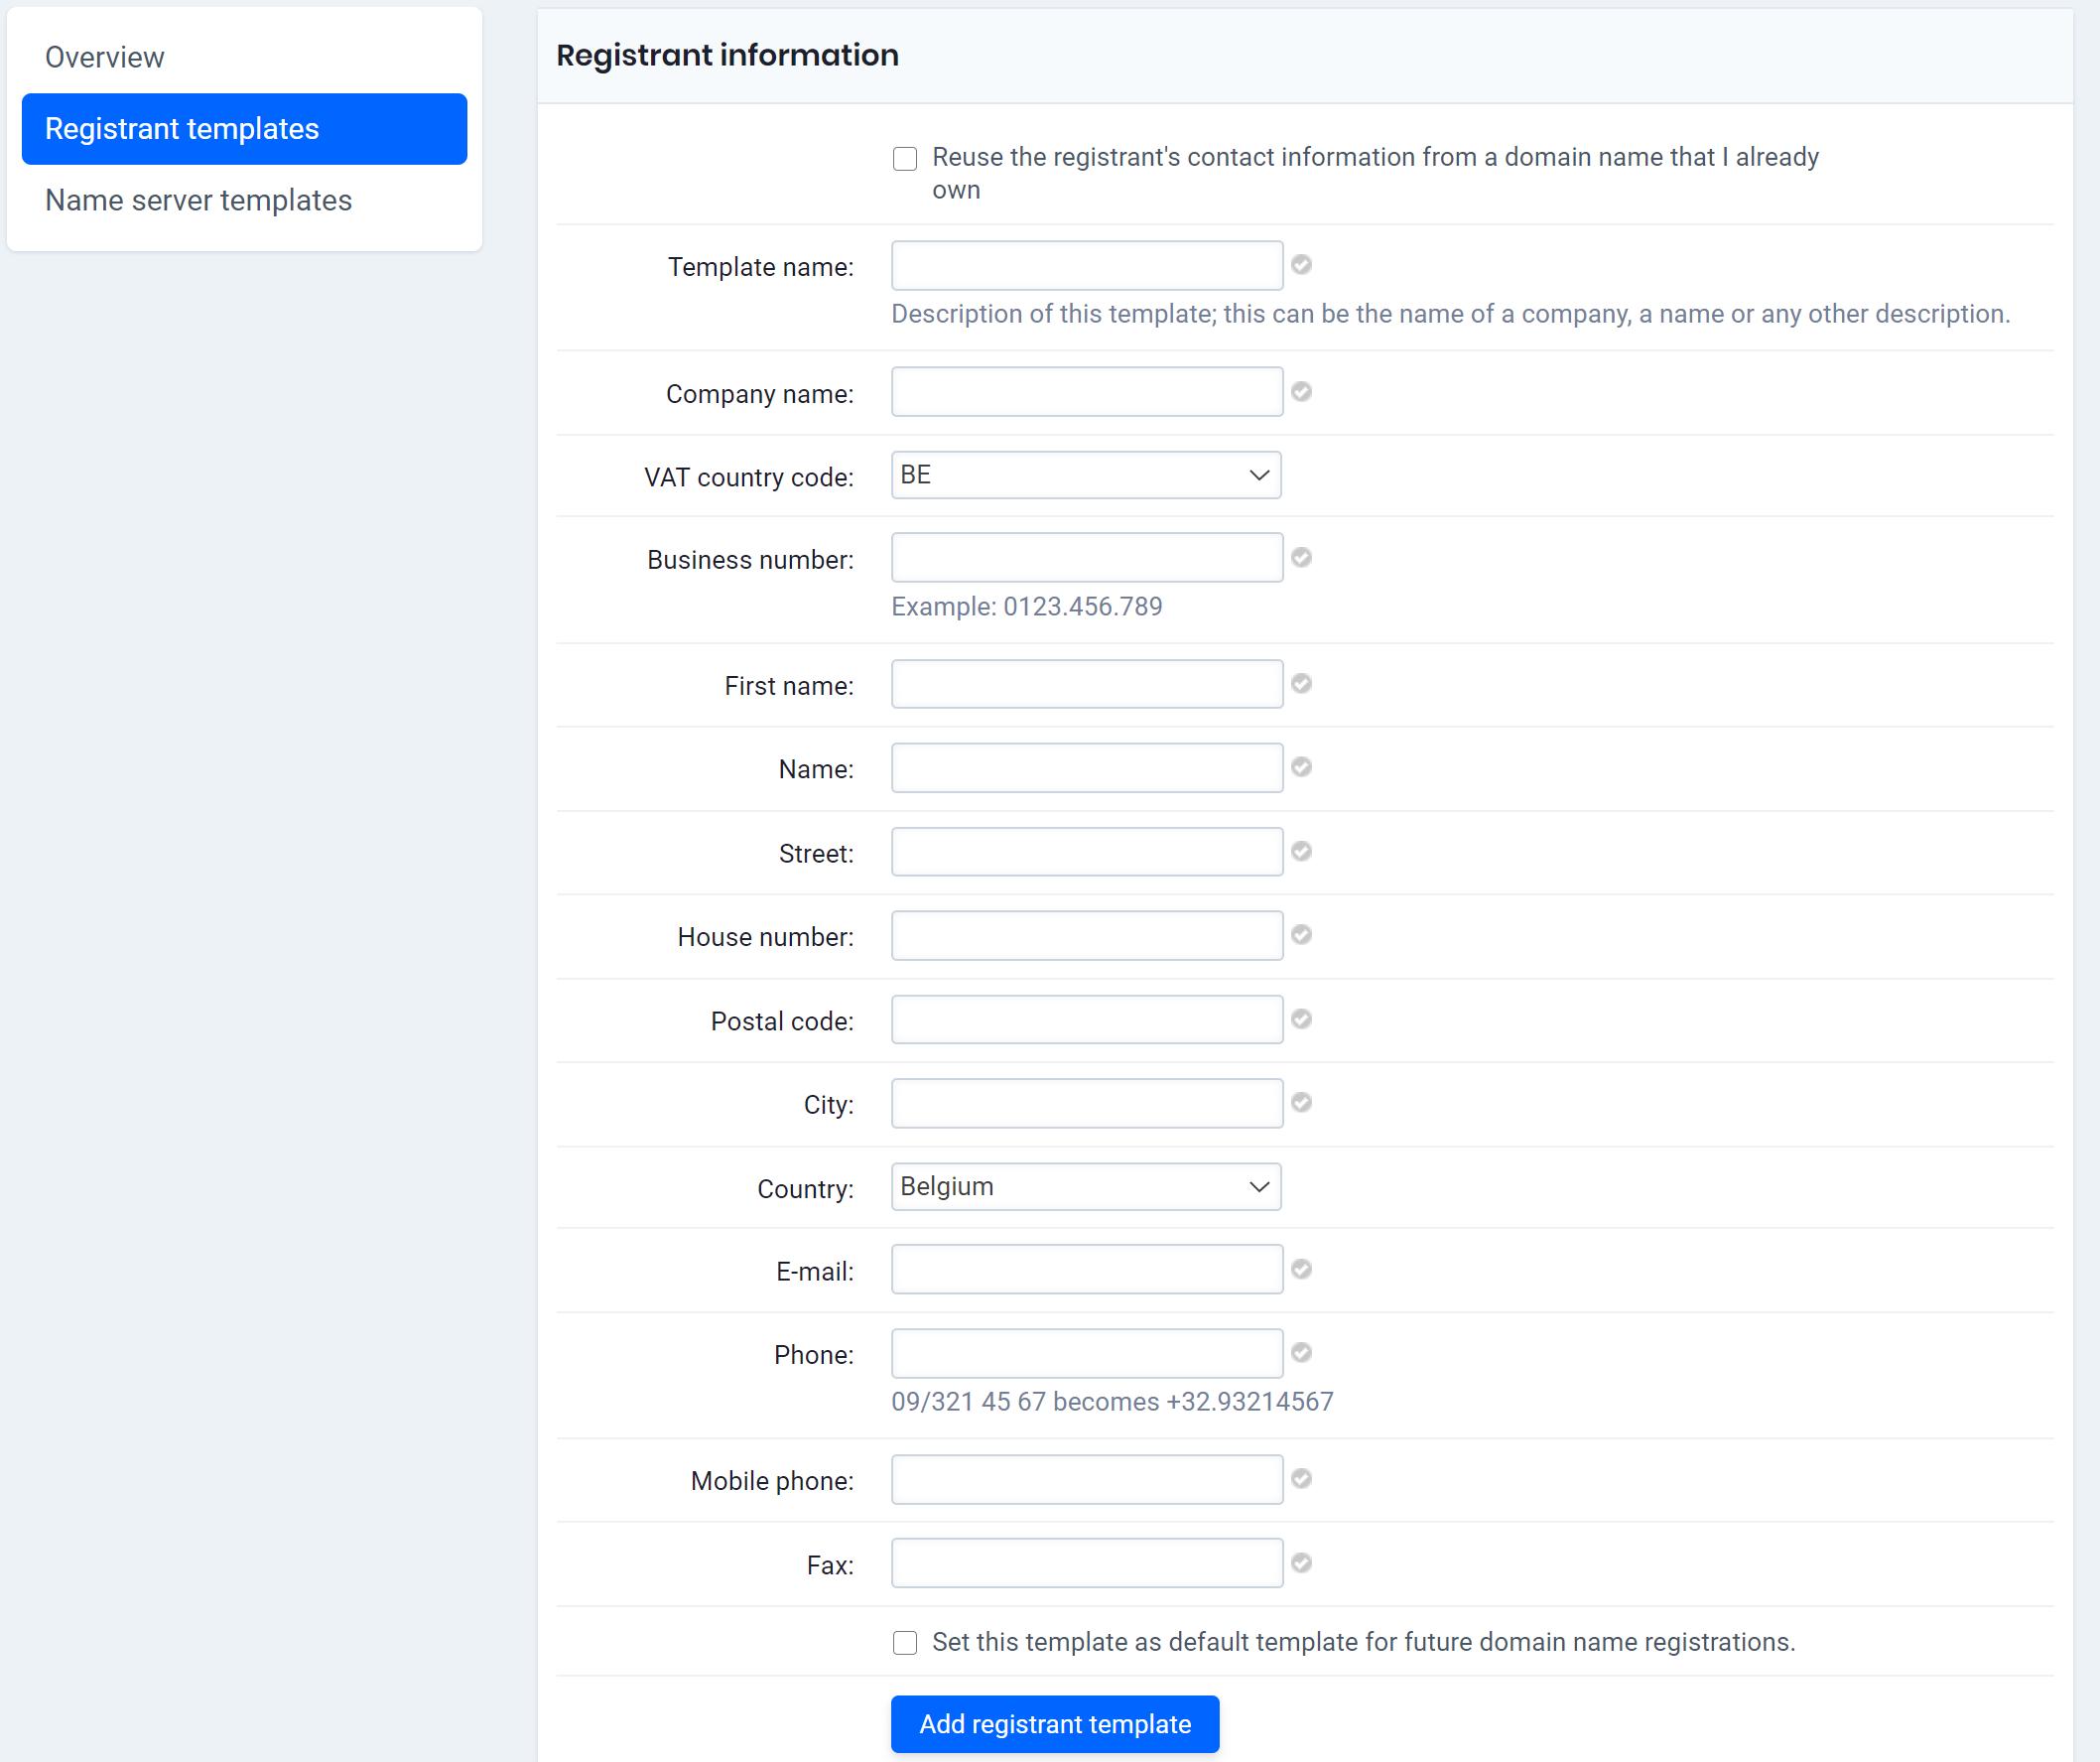 add registrant template